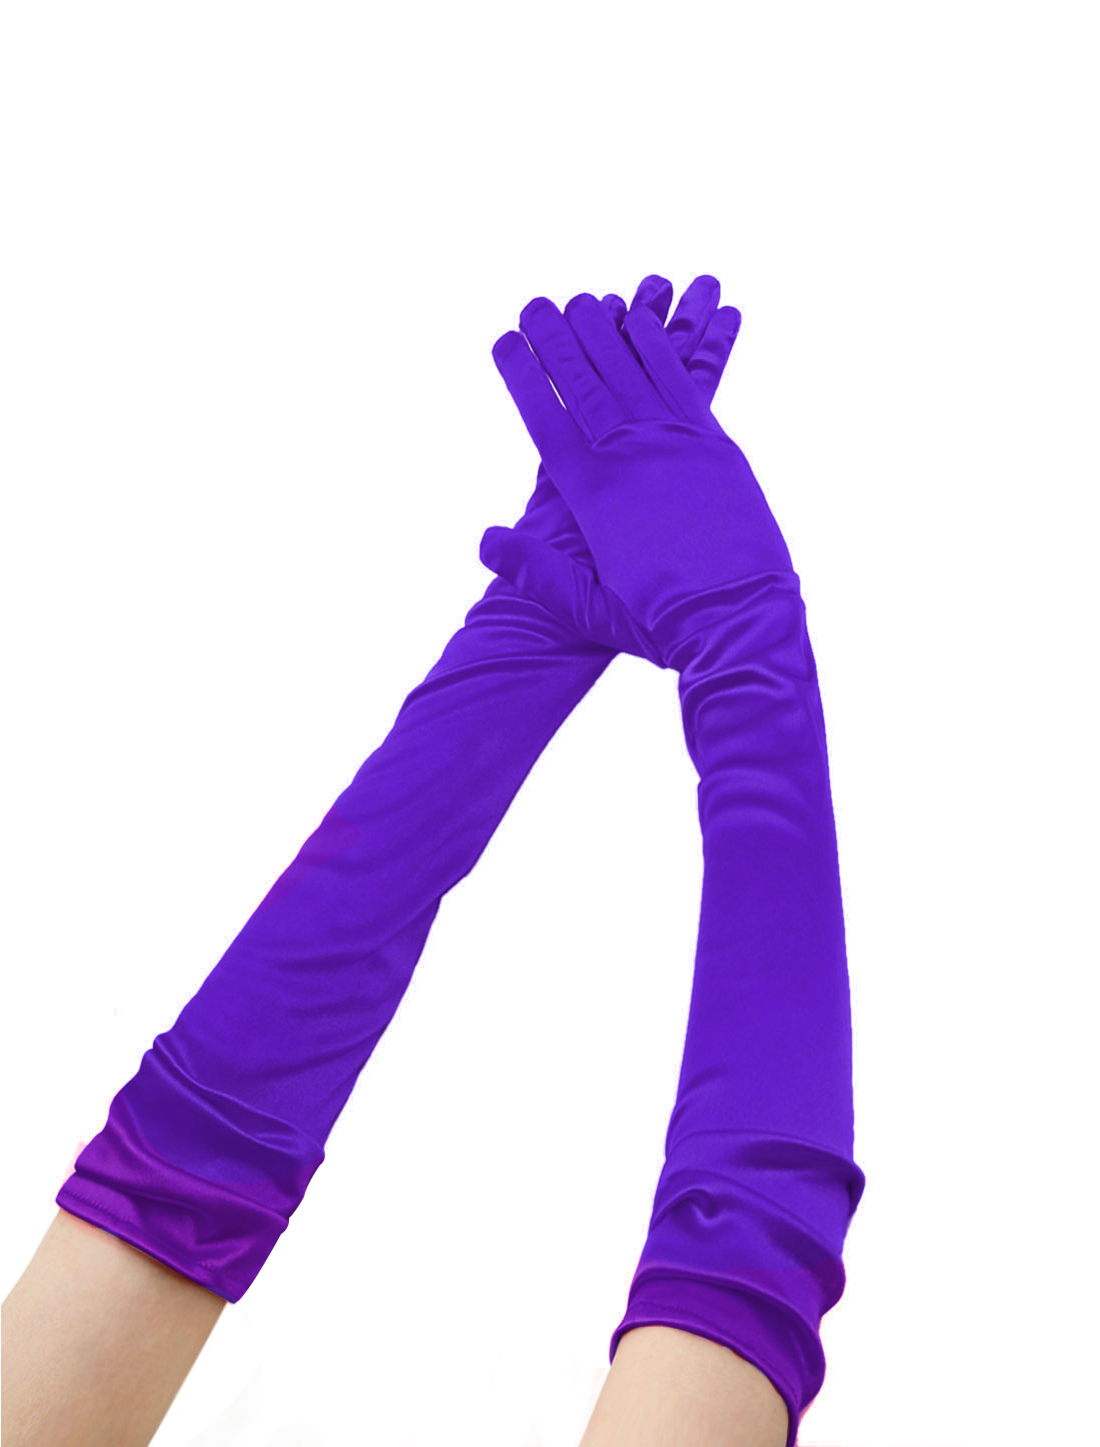 Women Shiny Stretchy Opera Length Full Finger Gloves Pair Purple